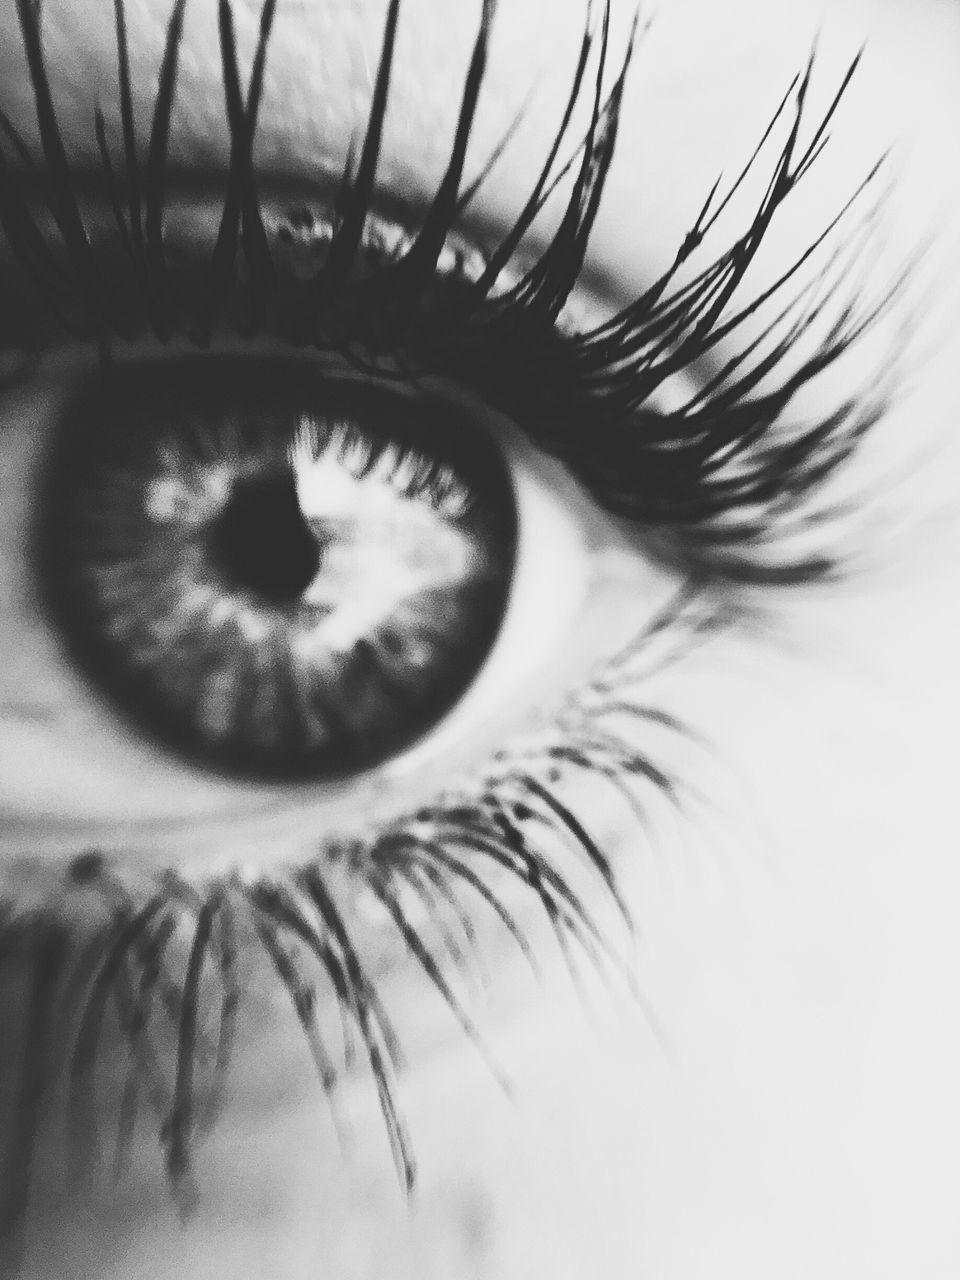 eyelash, human eye, human body part, sensory perception, one person, macro, close-up, eyesight, real people, eyeball, outdoors, iris - eye, day, people